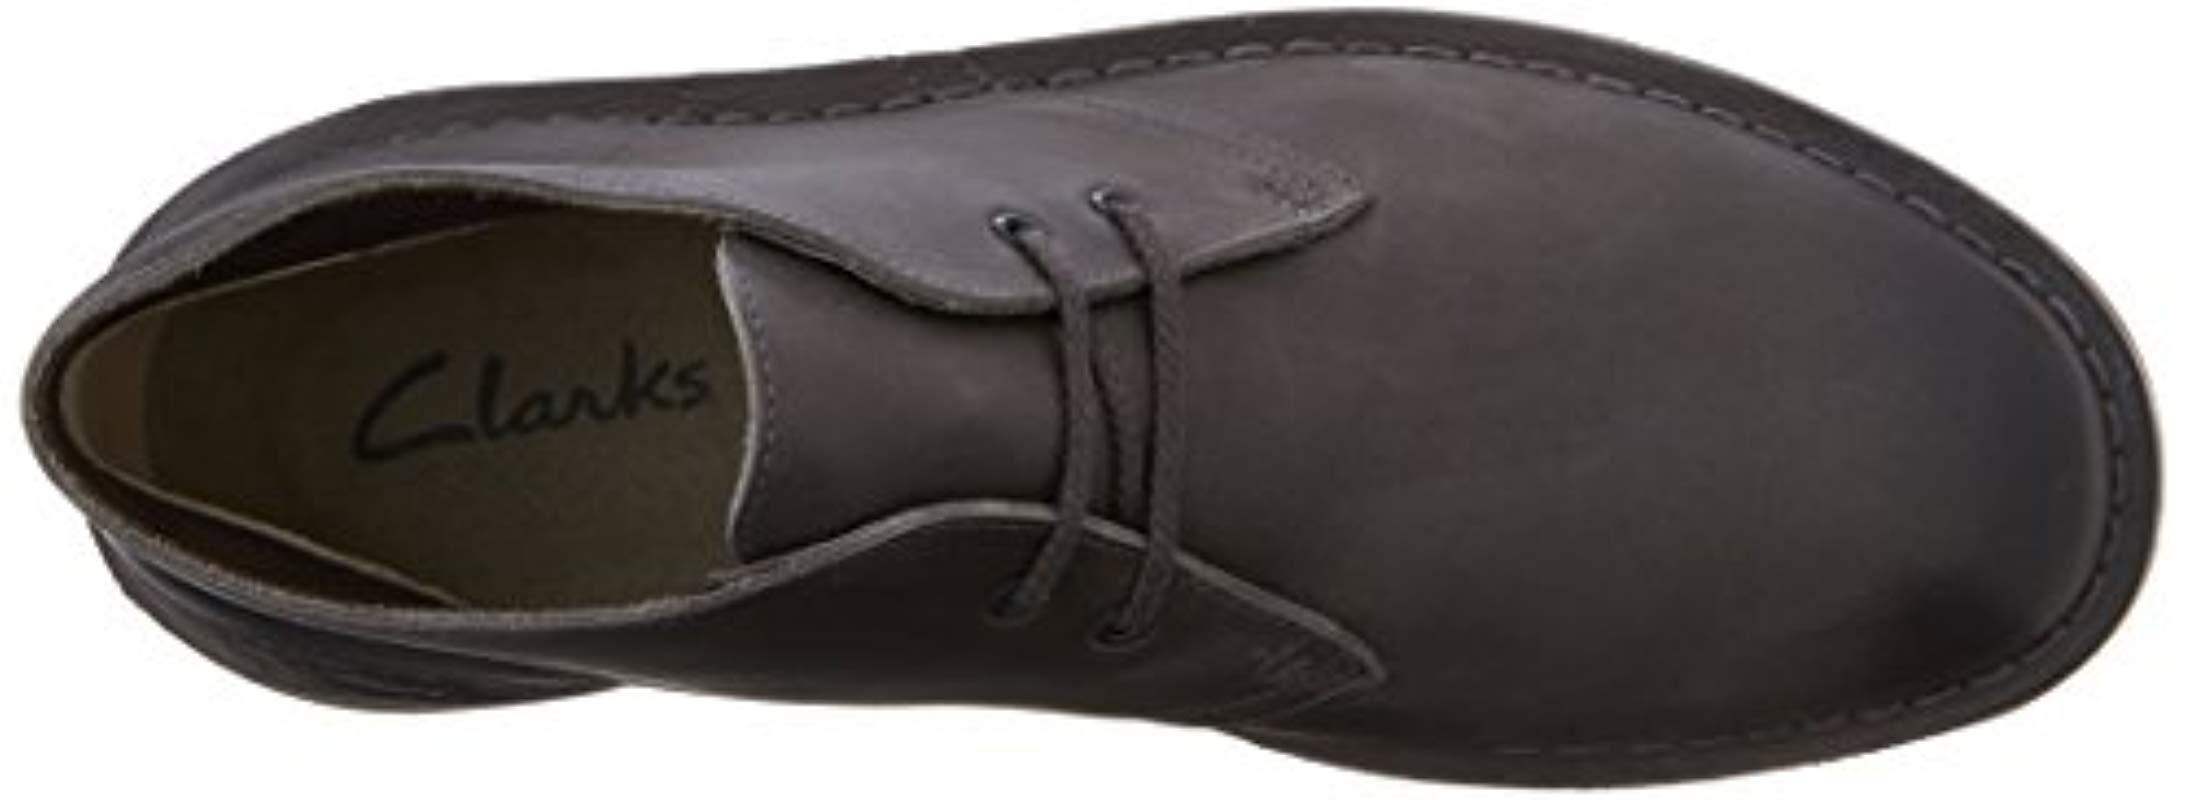 de68b295bc4 Clarks Gray Bushacre 2 Chukka Boot, Grey Leather, 7.5 Uk for men